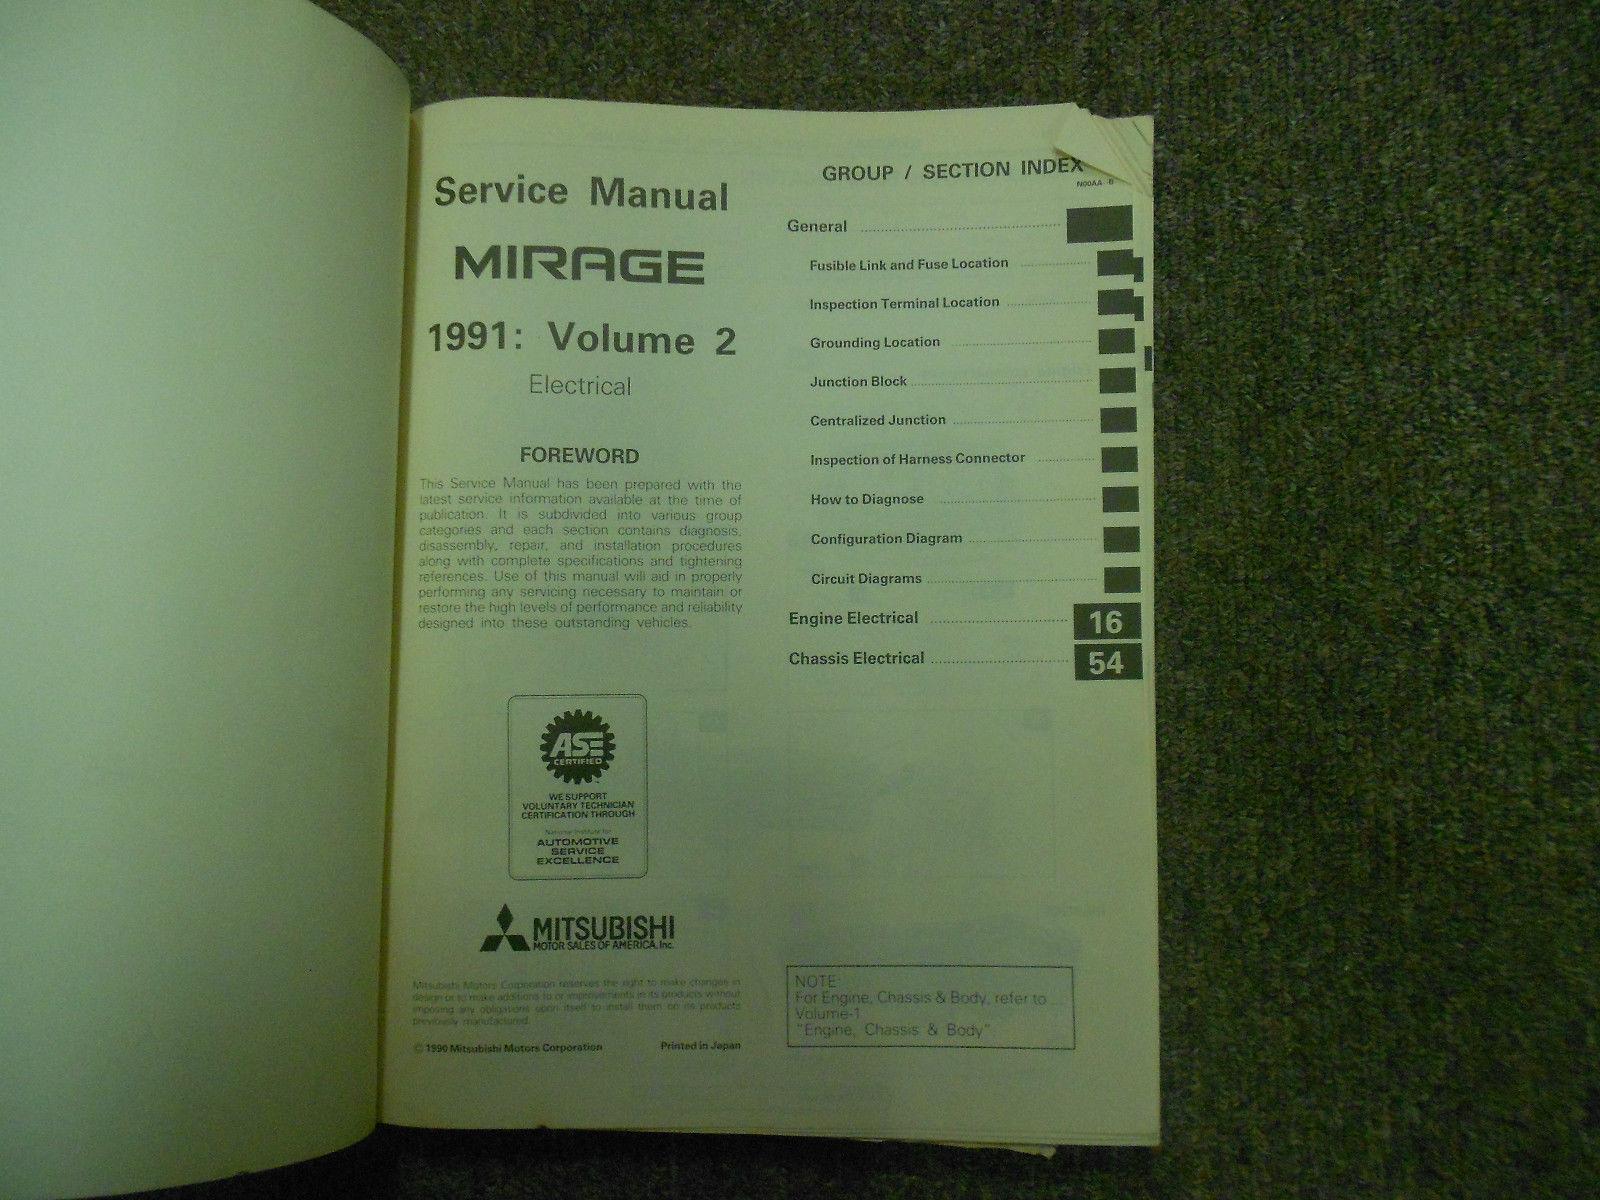 1991 MITSUBISHI Mirage Service Repair Shop Manual FACTORY OEM BOOK 91 3 VOL SET